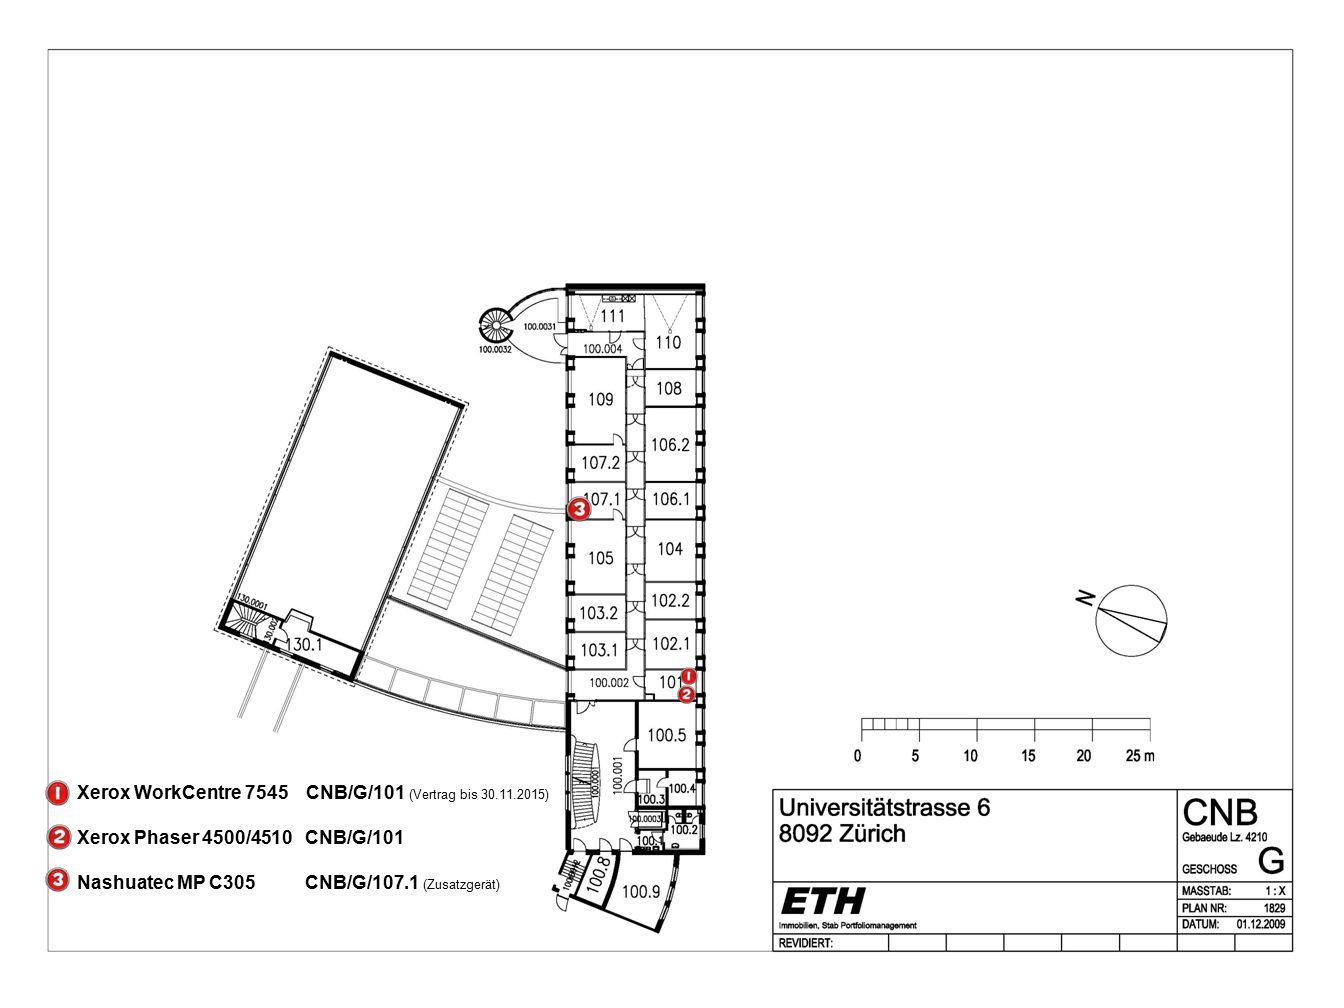 Xerox WorkCentre 7545 CNB/G/101 (Vertrag bis 30.11.2015) Xerox Phaser 4500/4510 CNB/G/101 Nashuatec MP C305 CNB/G/107.1 (Zusatzgerät)